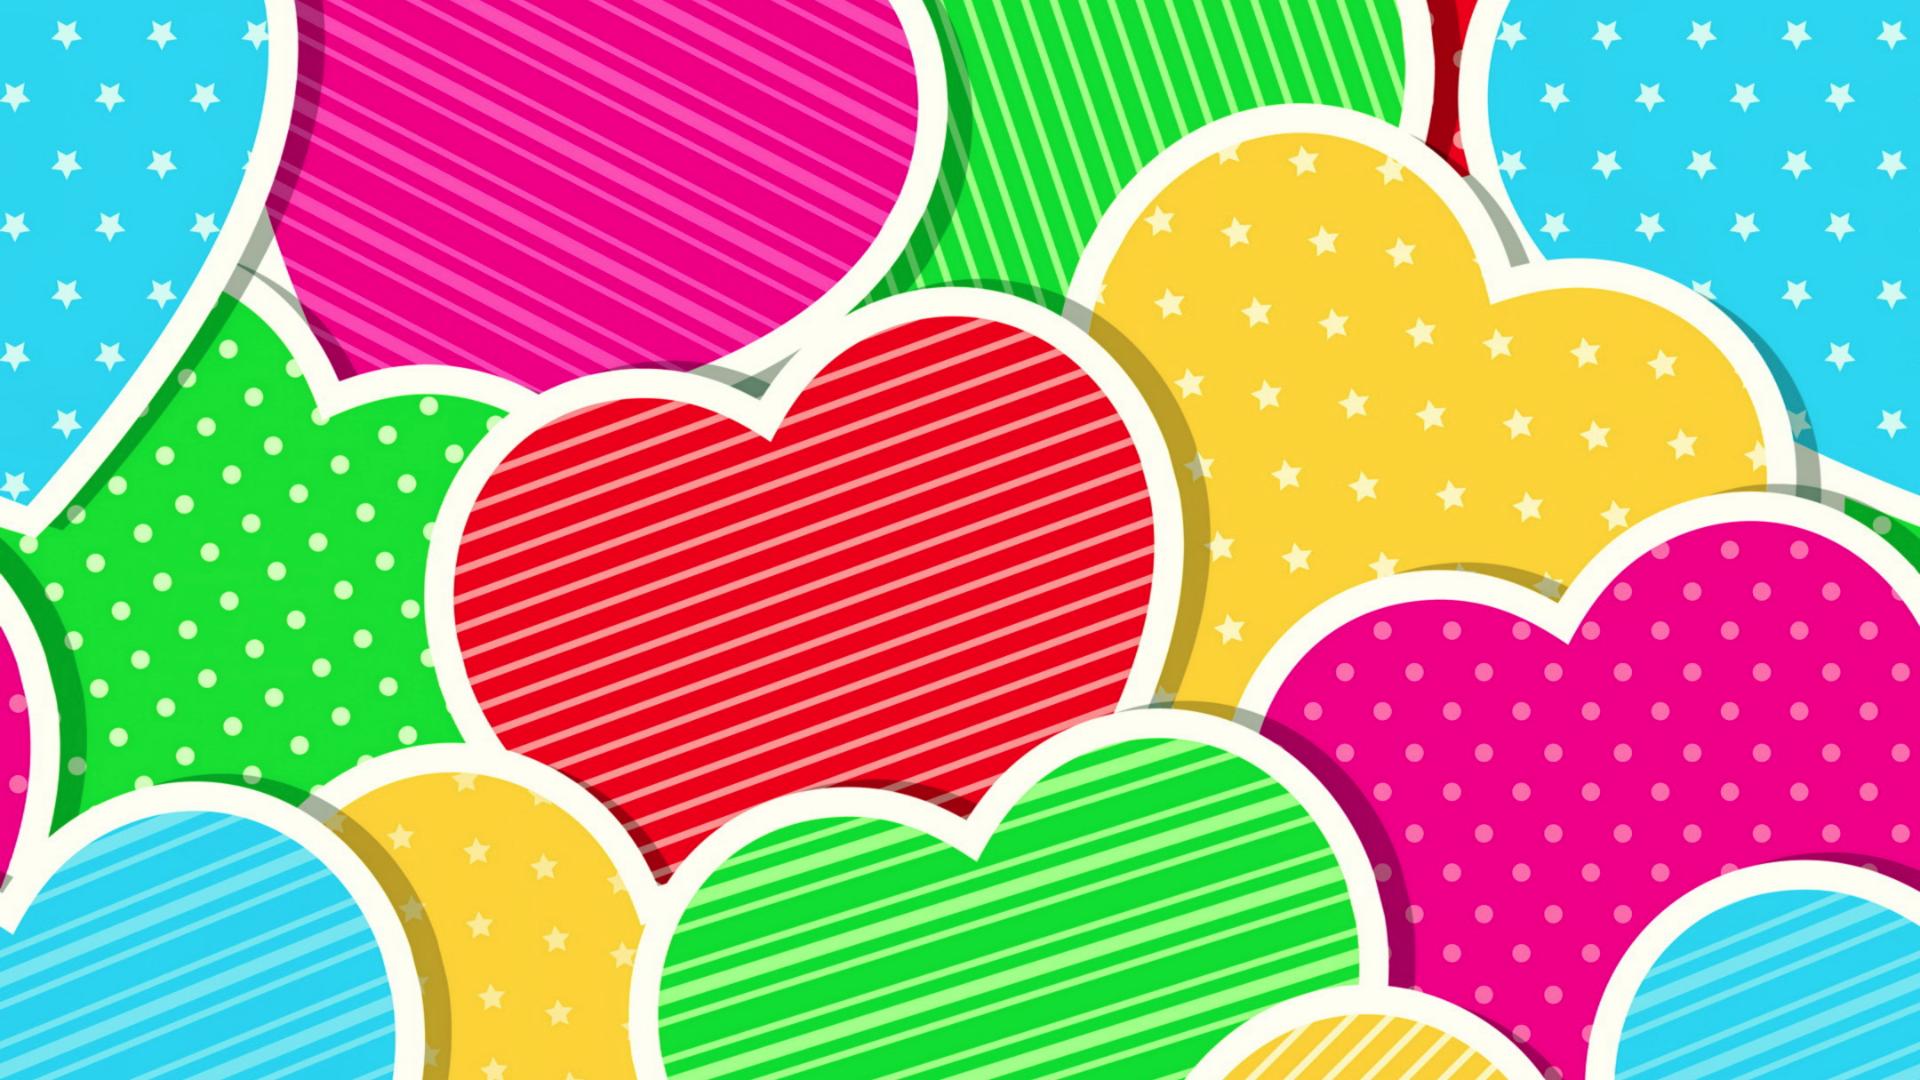 Rainbow Heart Wallpaper - WallpaperSafari - photo#46